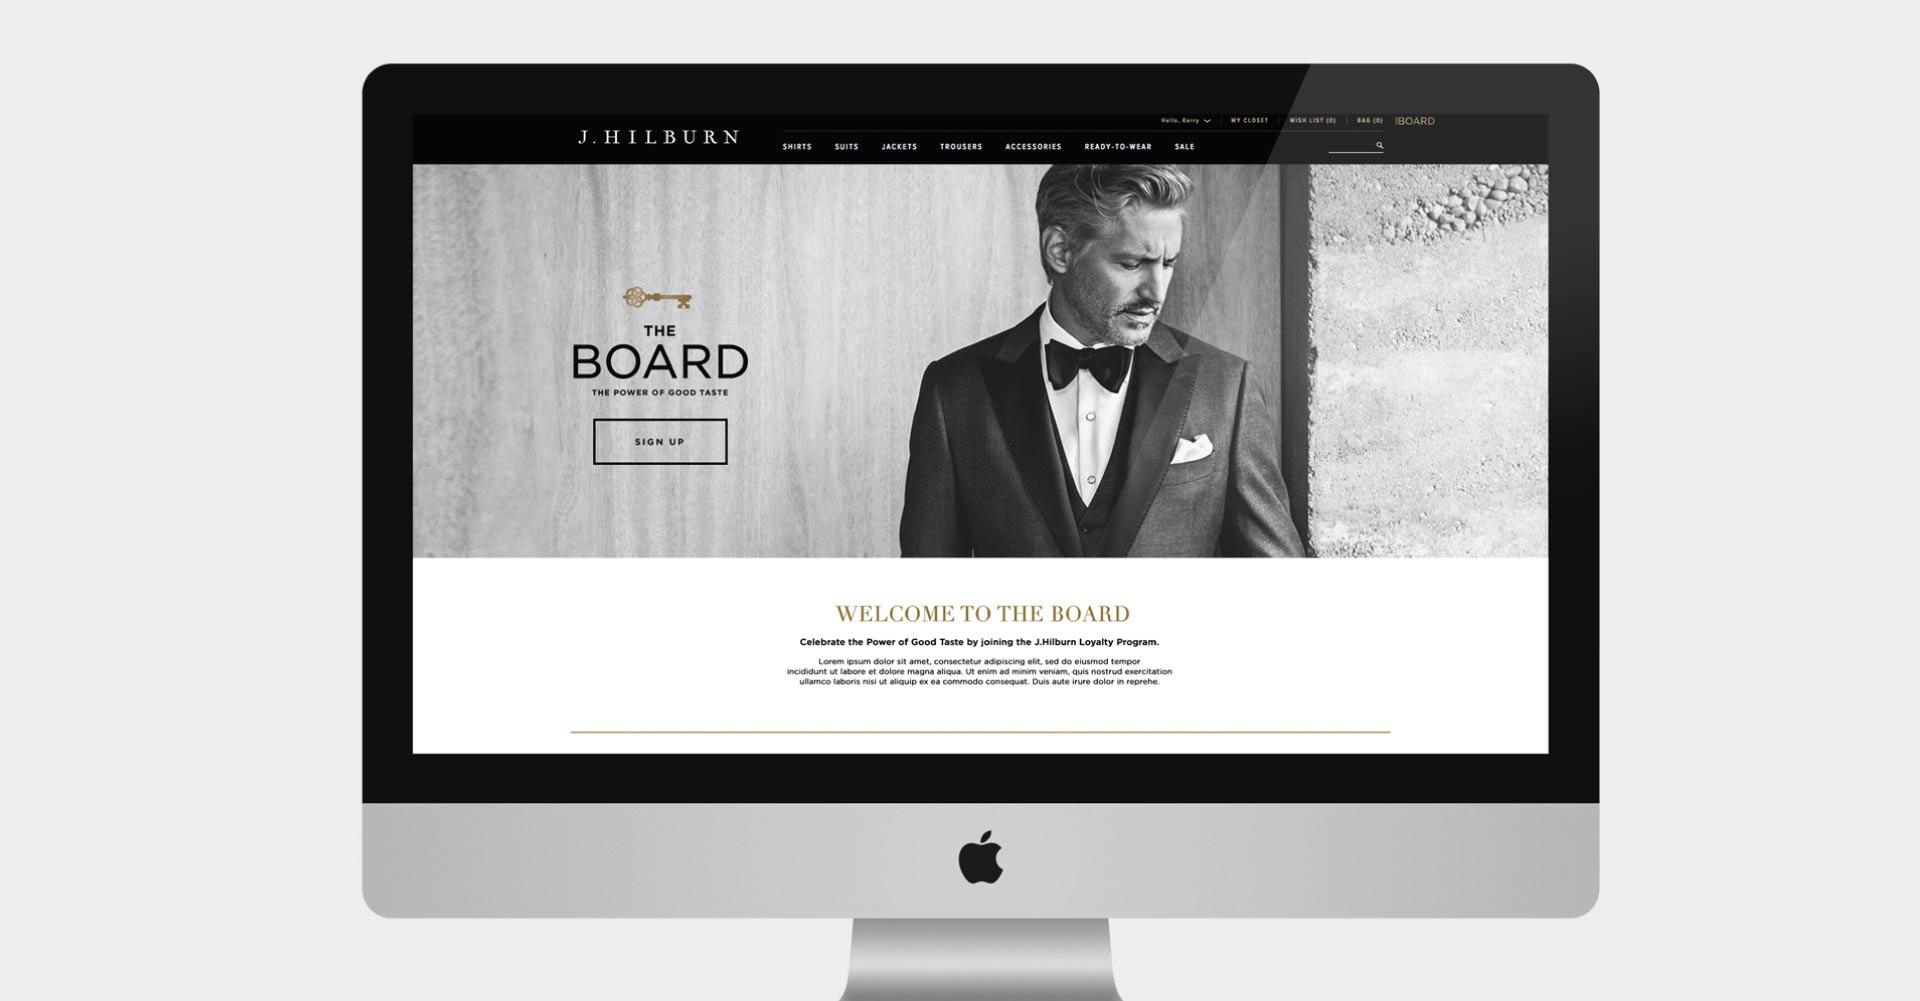 Creative_Retail_Packaging_Branding_Identity_Web_Design_JHilburn_14.jpg